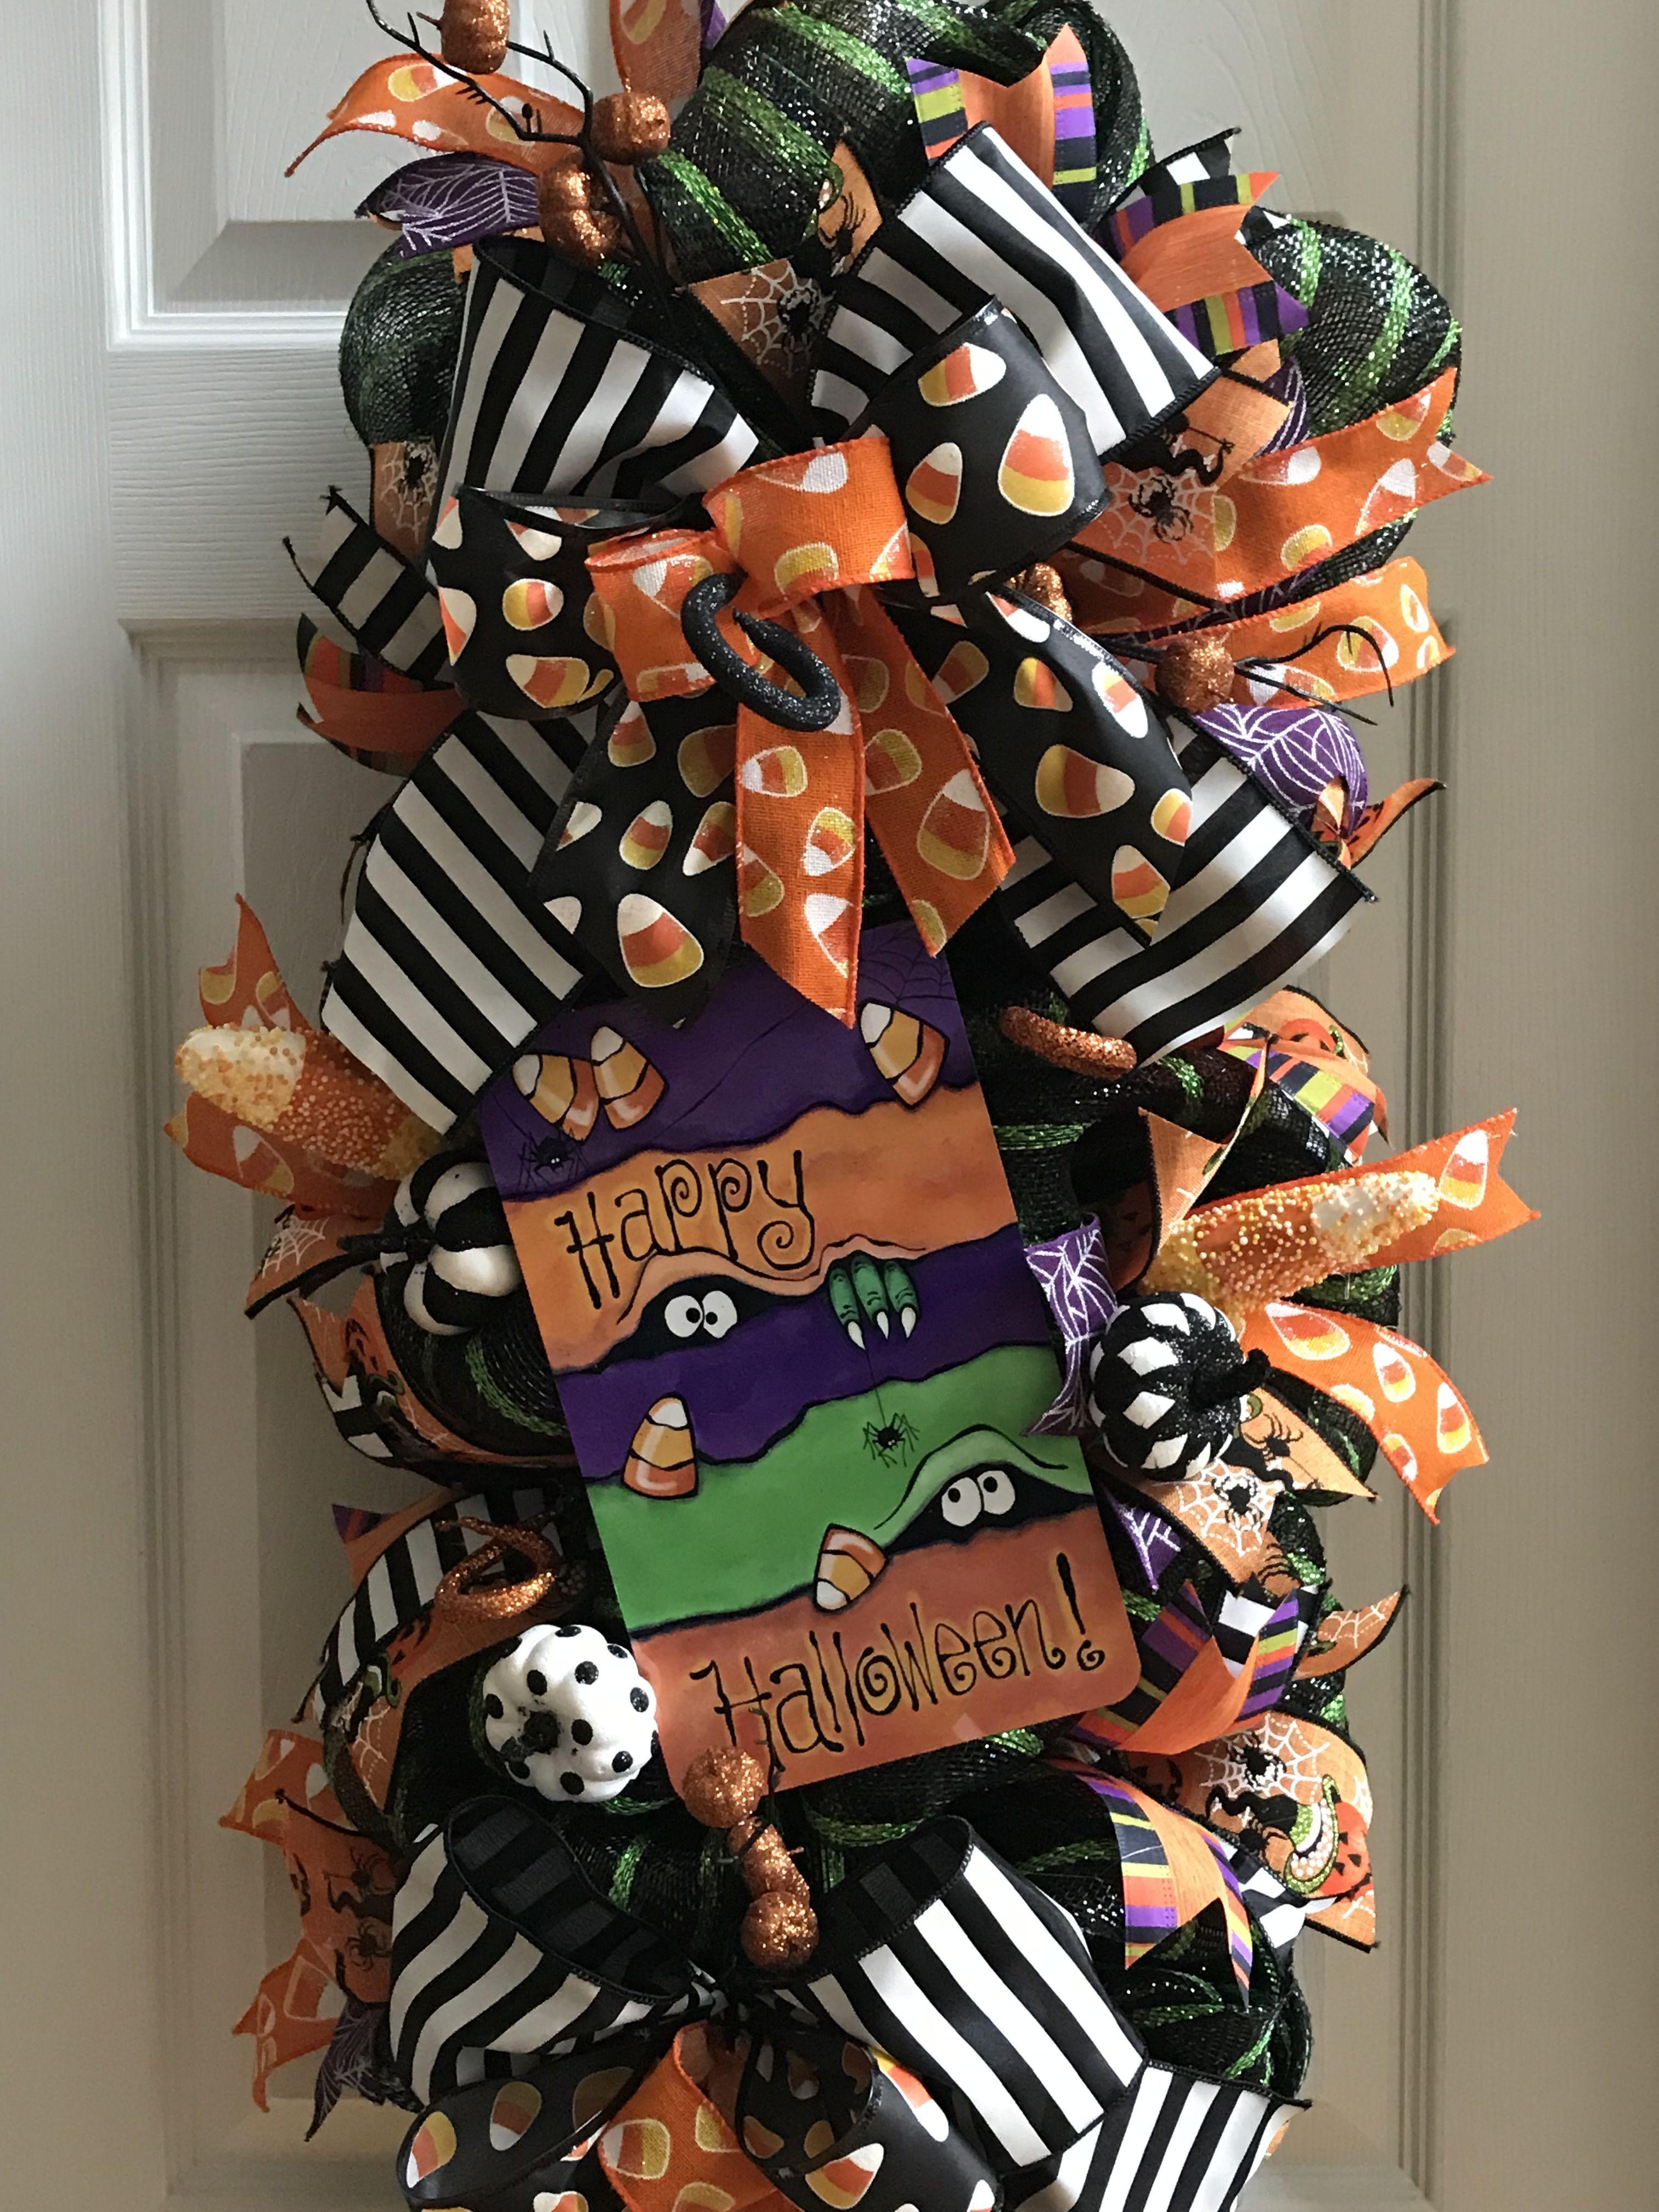 Just A Little Treat For Your Halloween #Happyhalloween #Wreathmaker #Trickortreat